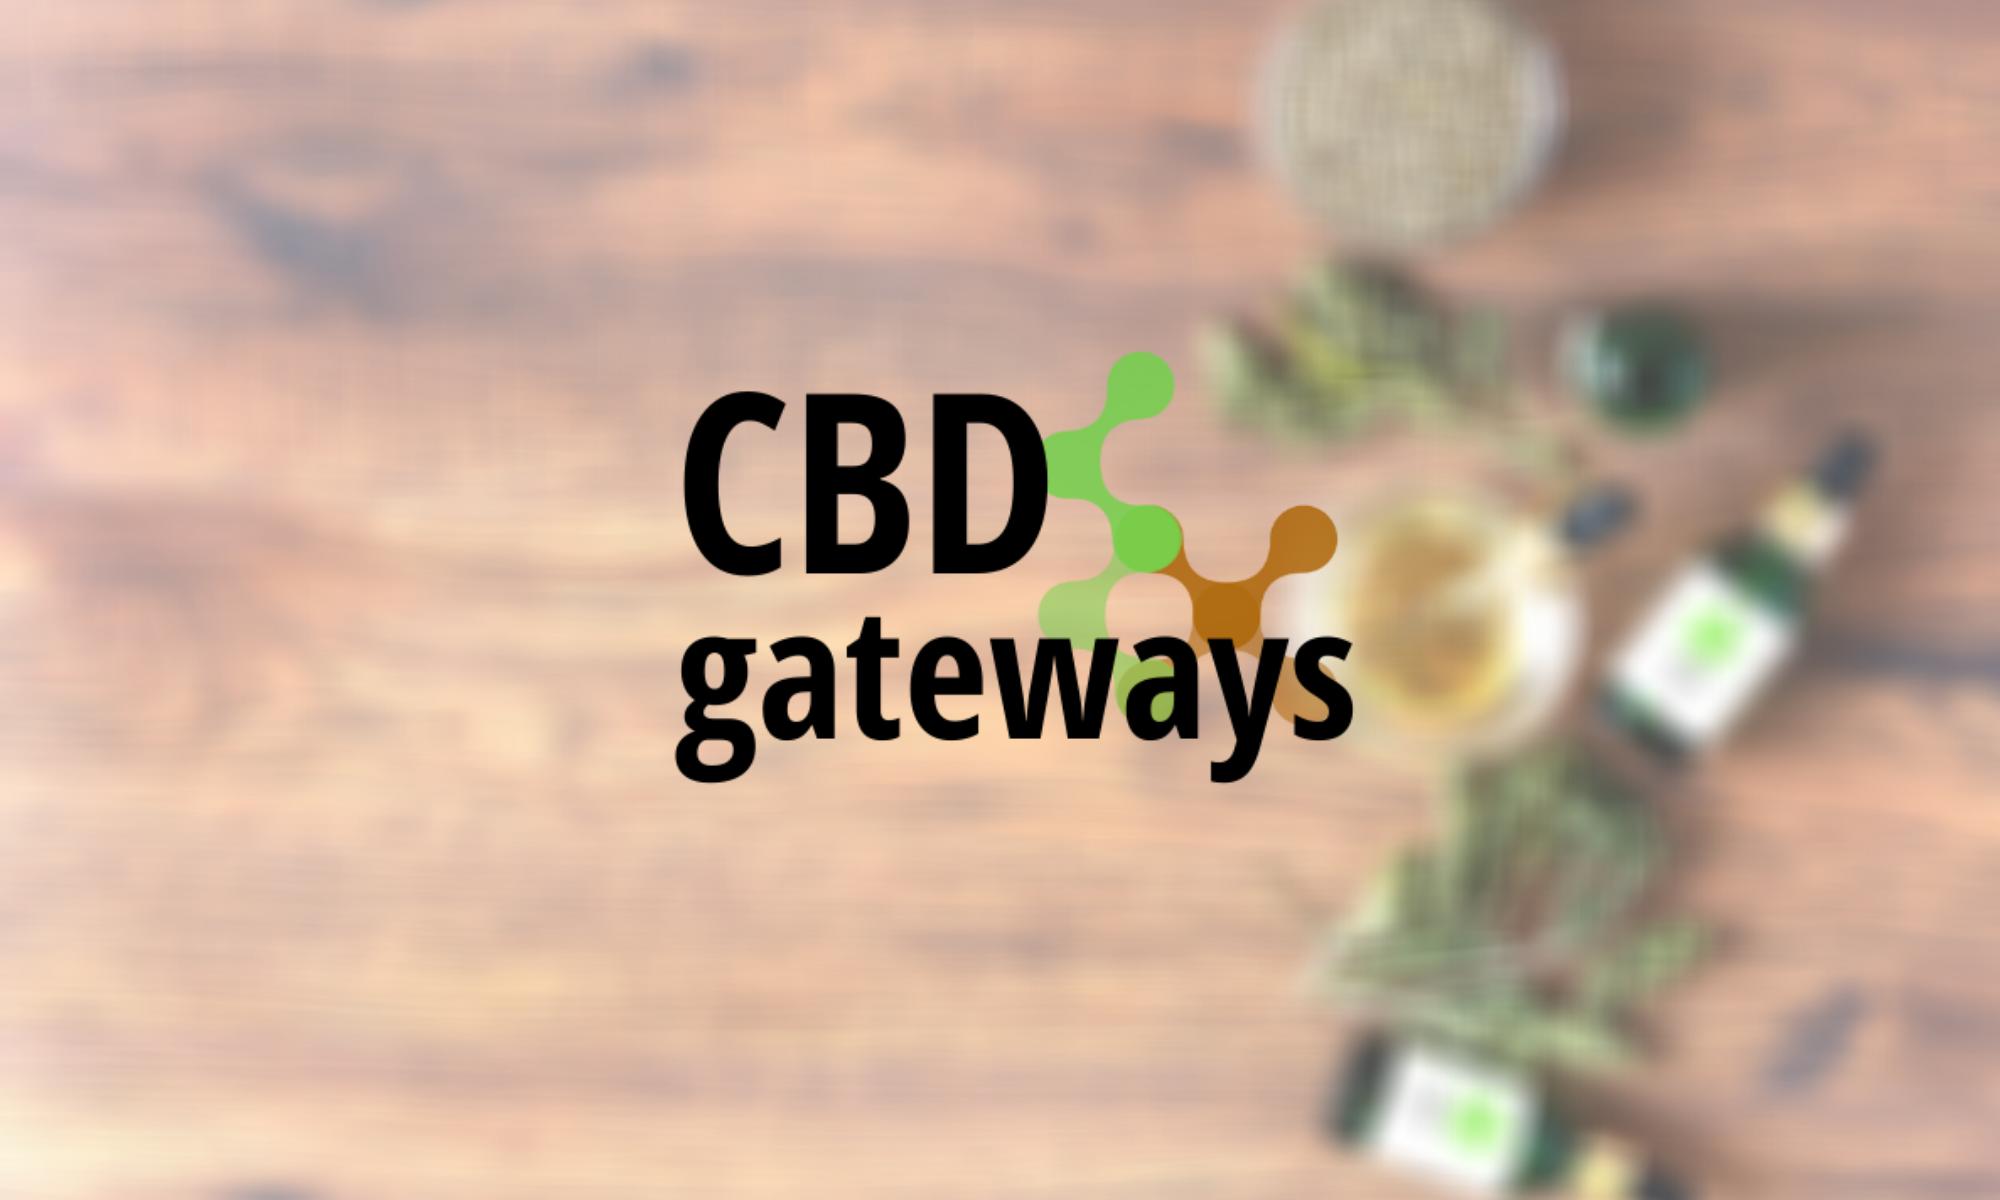 CBD Gateways